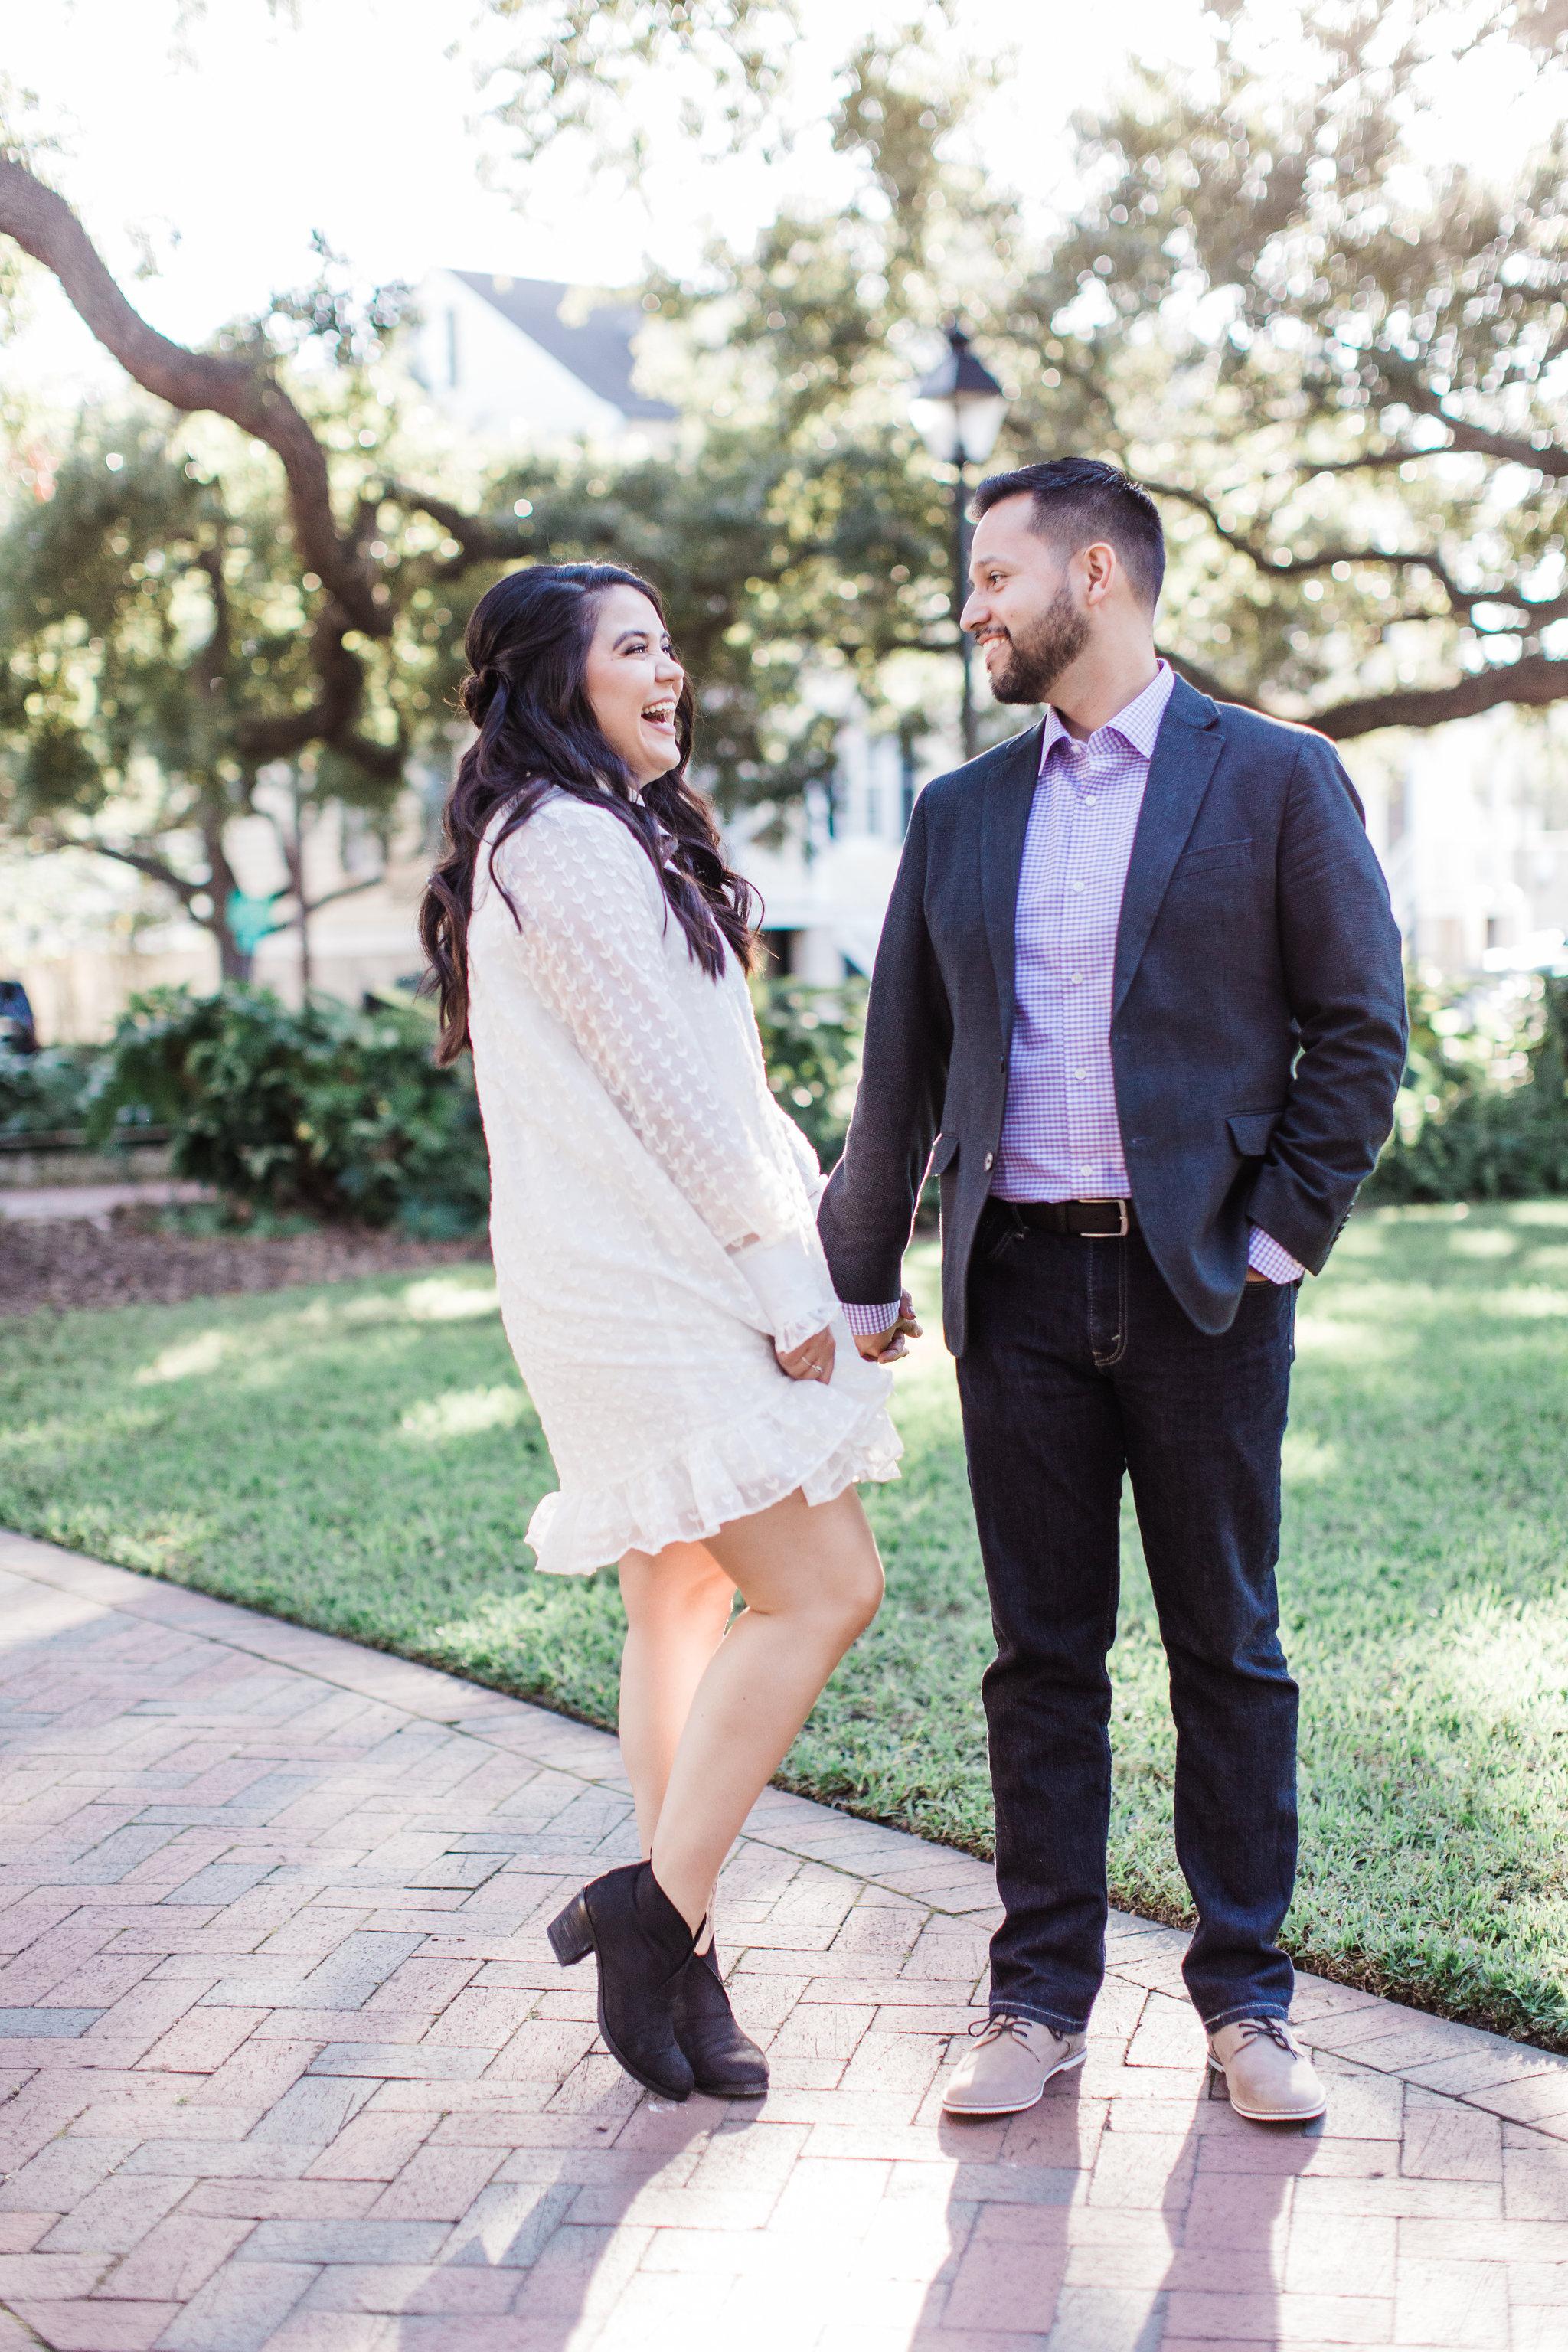 apt-b-photography-Savannah-wedding-photographer-savannah-engagement-photographer-historic-savannah-engagement-savannah-weddings-hilton-head-wedding-photographer-hilton-head-engagement-18.jpg